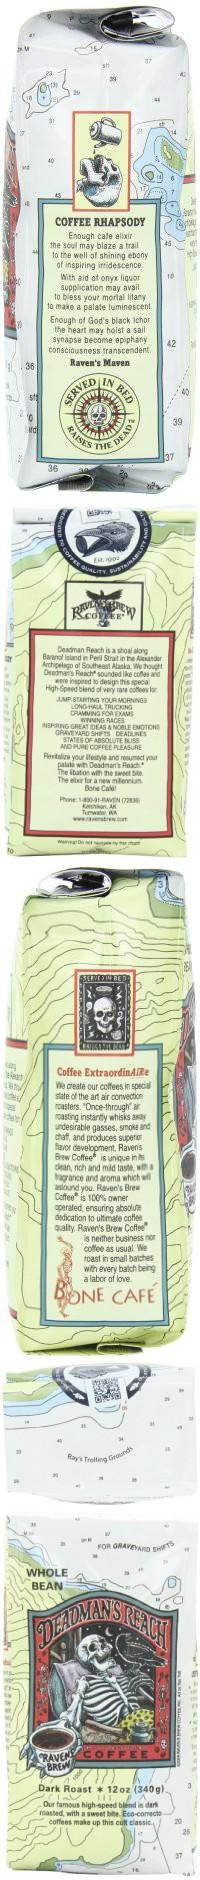 Raven's Brew Whole Bean Deadman's Reach,Dark Roast 12-Ounce Bags (Pack of 2)